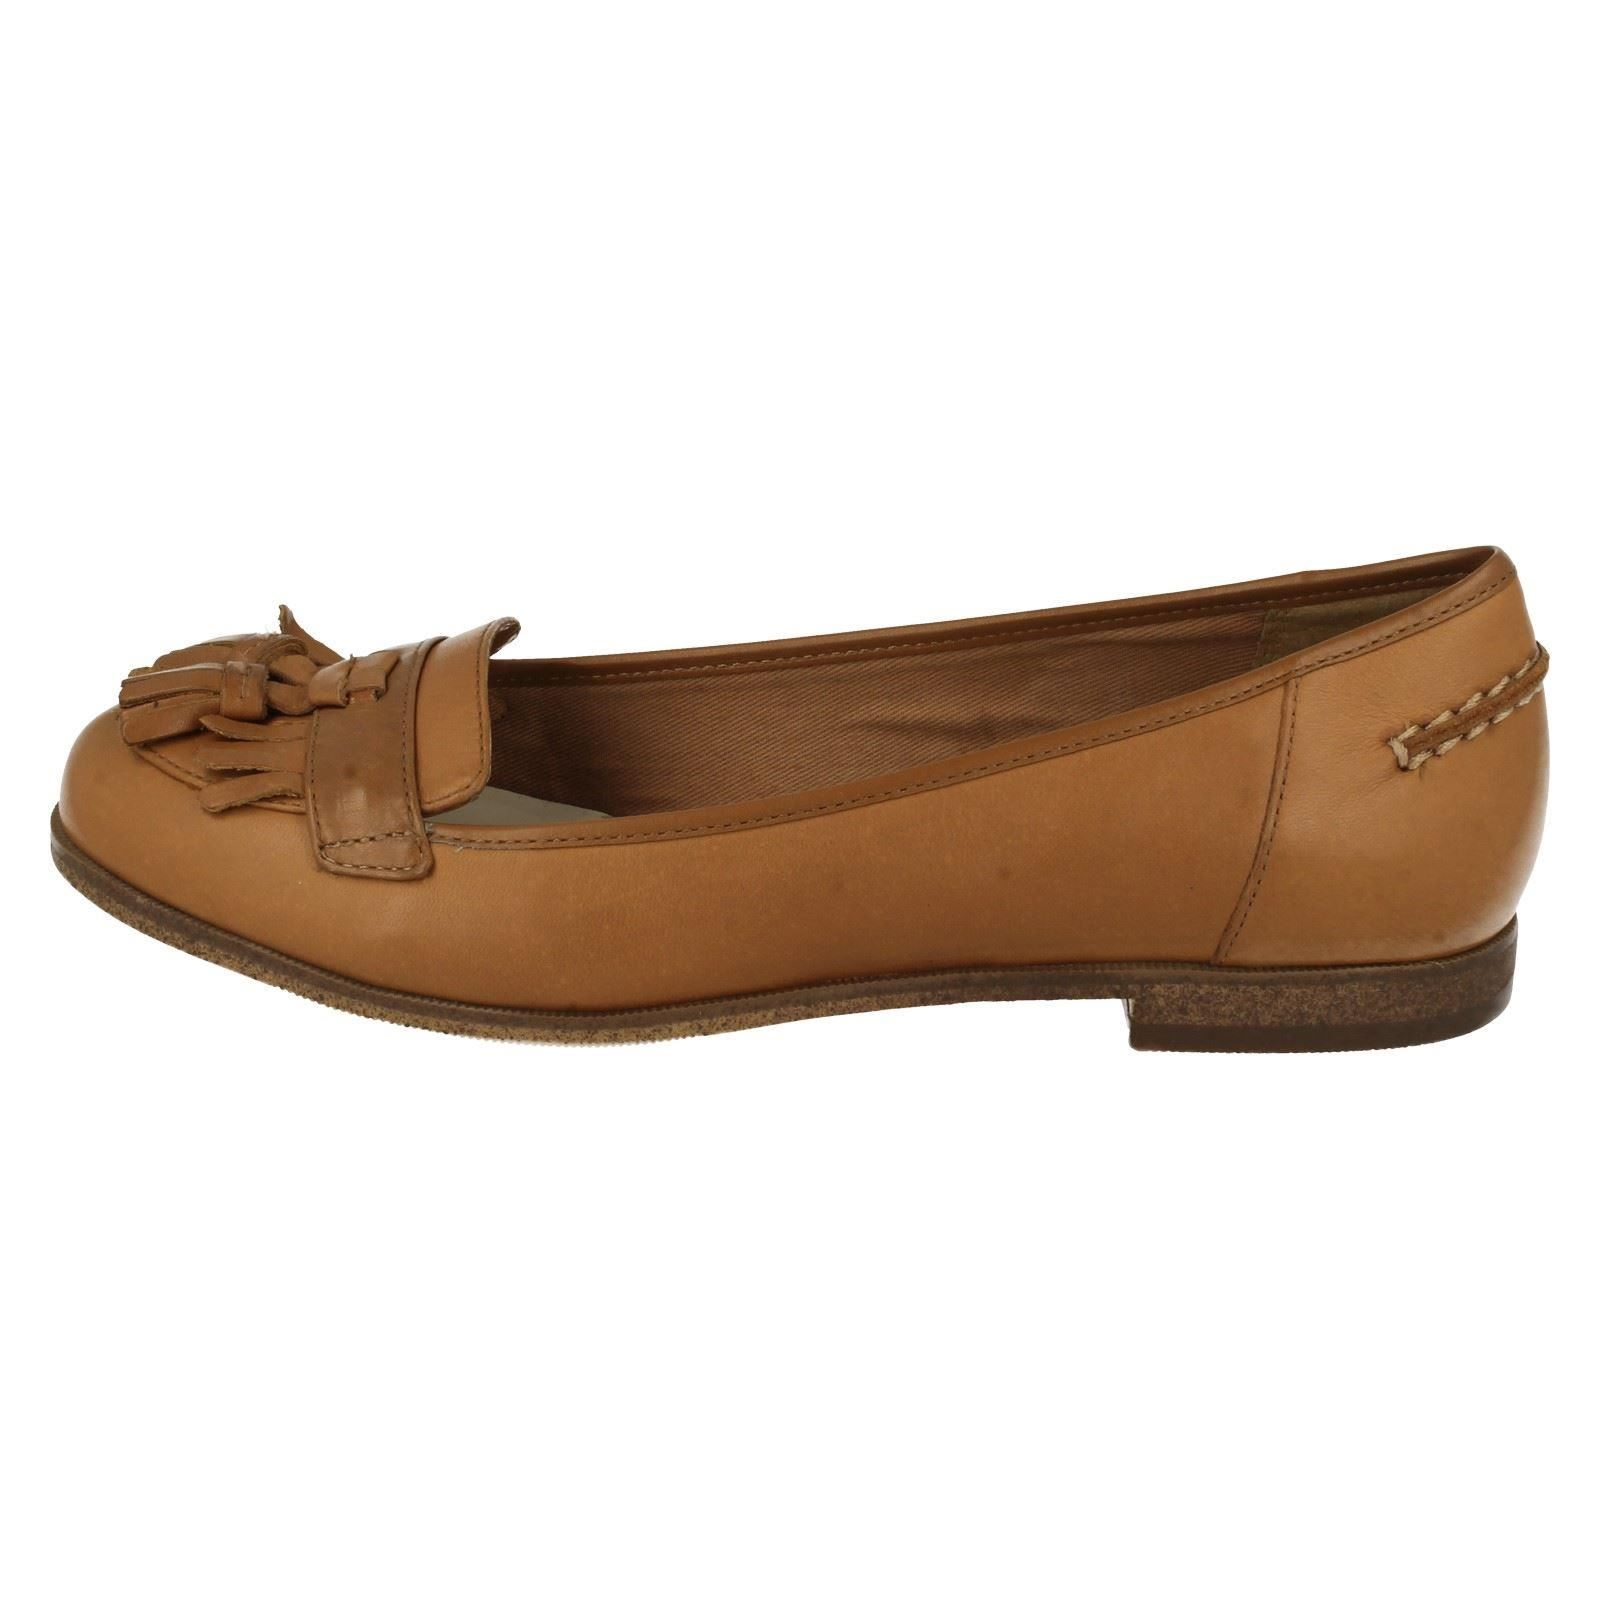 Ladies Clarks Loafer Flats With Tassel Trim Angelica Slice